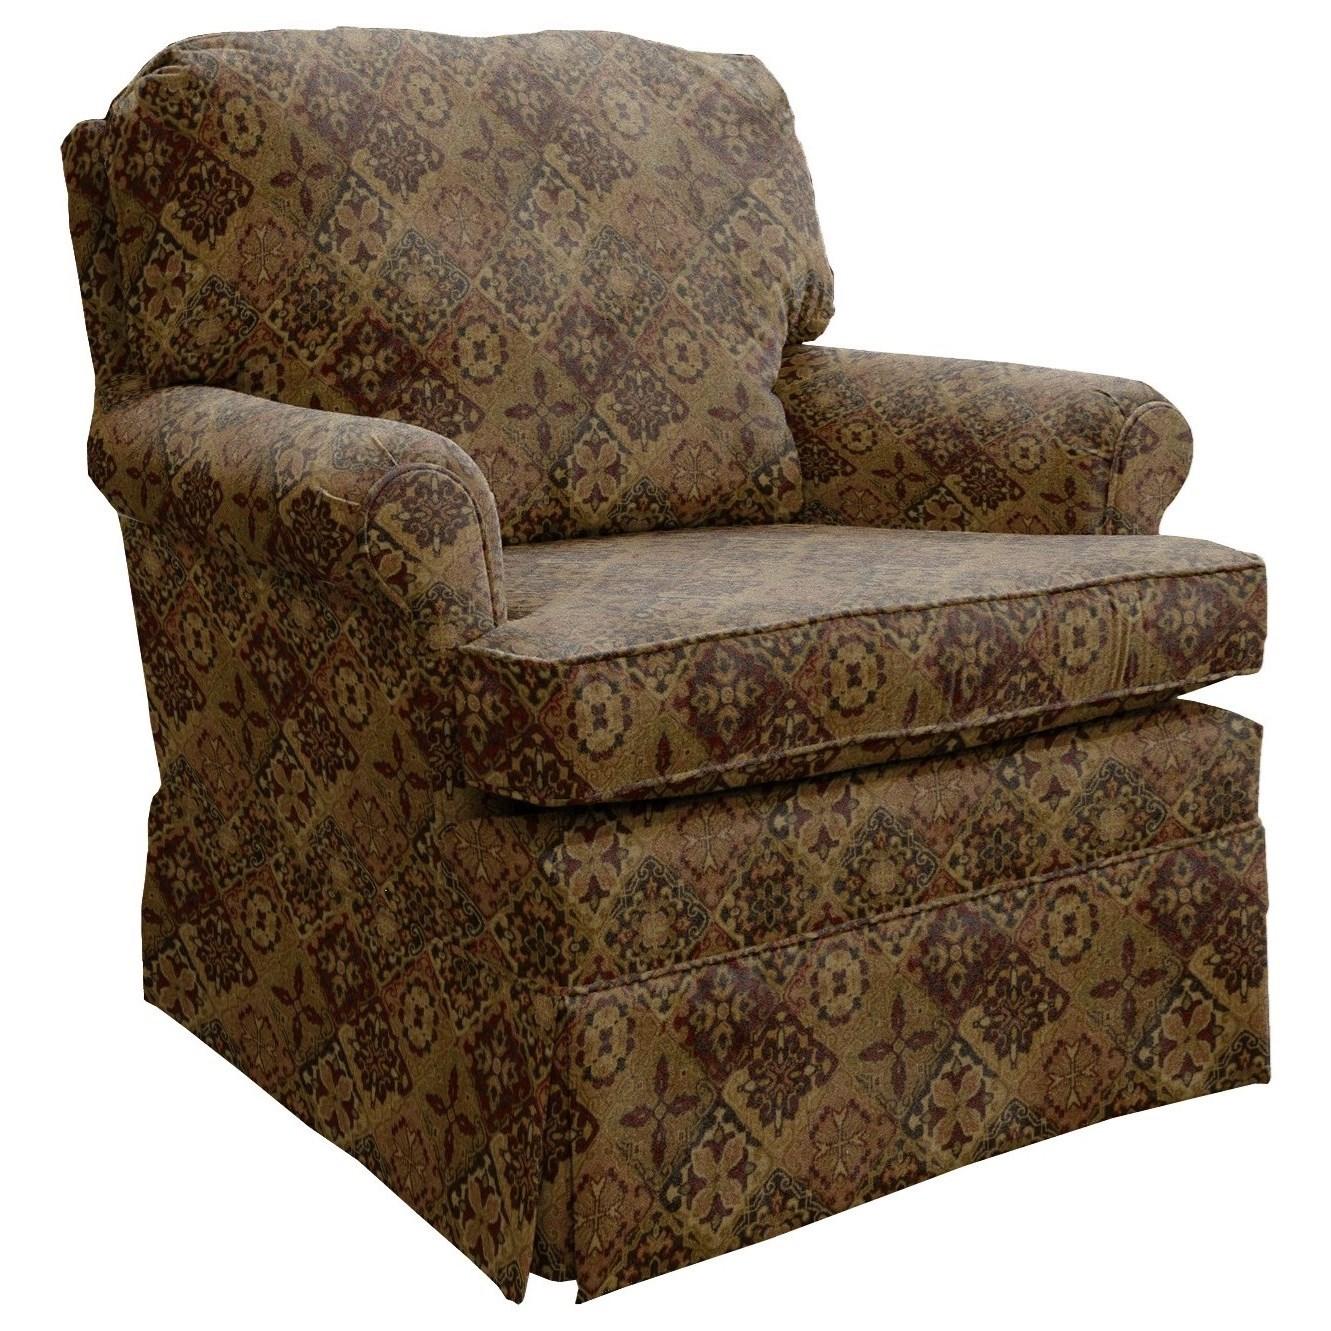 Best Home Furnishings Patoka Glider Club Chair - Item Number: 2616-28765